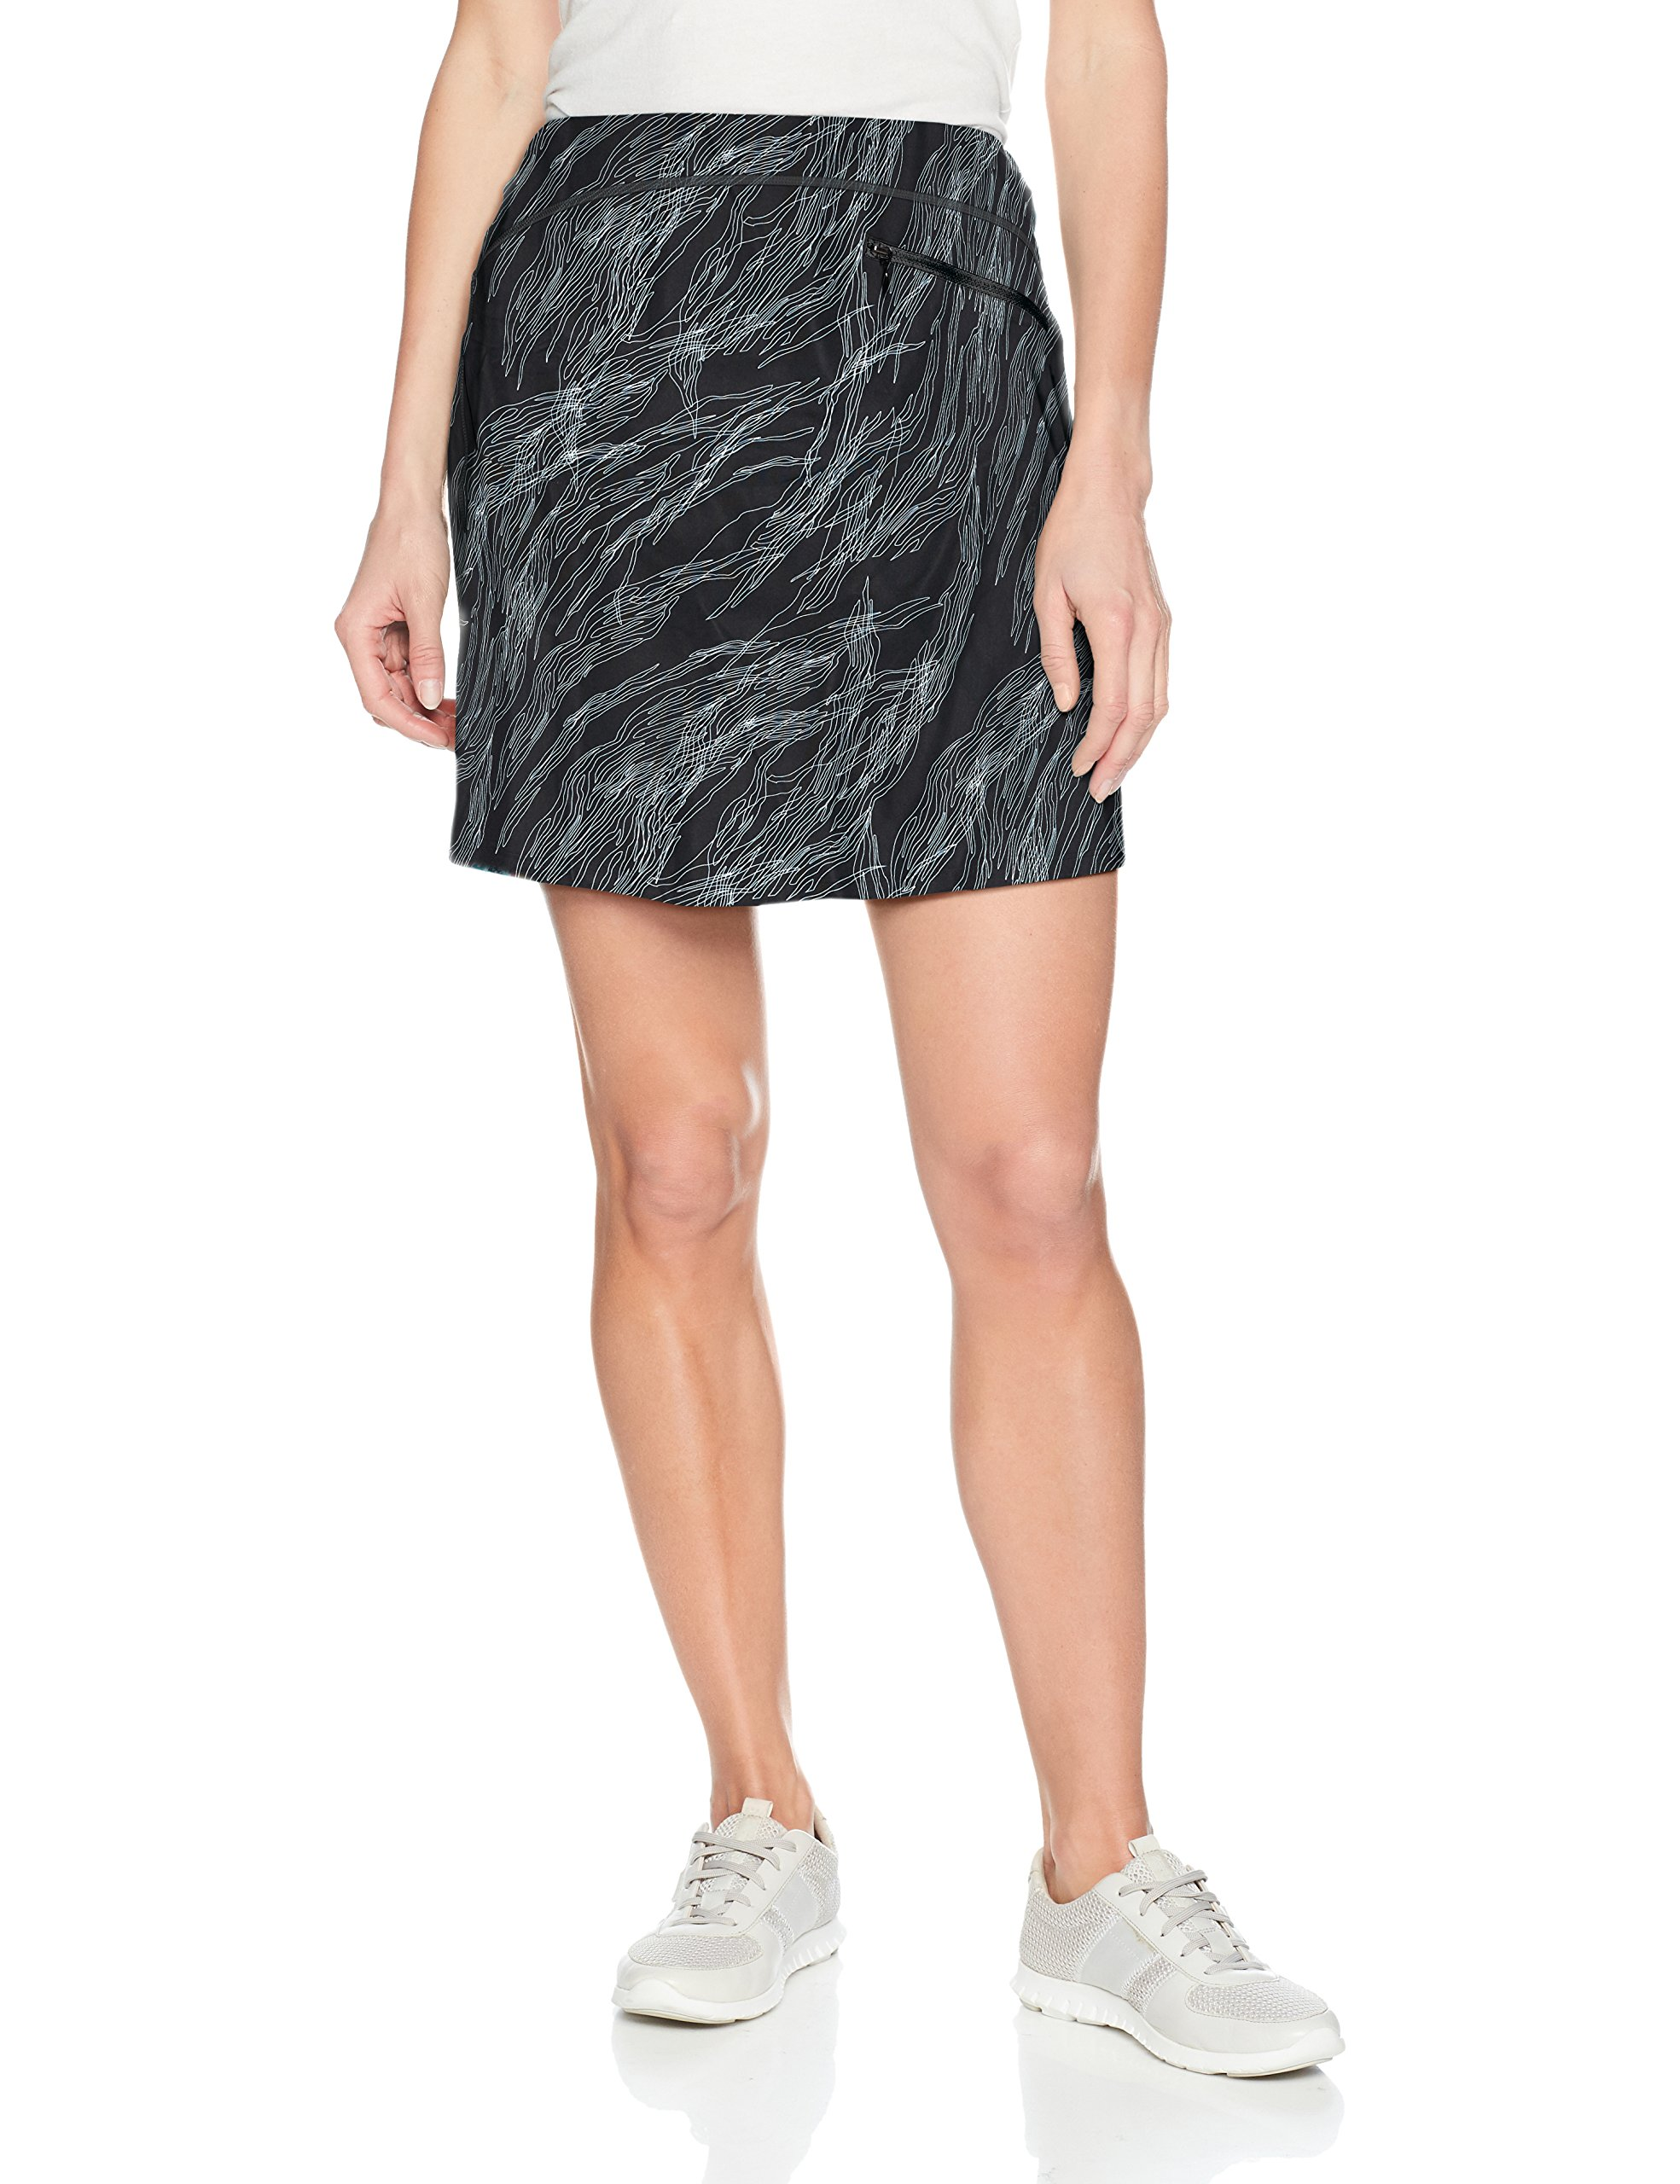 Skirt Sports Happy Girl Skirt, Night Dive Print, Medium